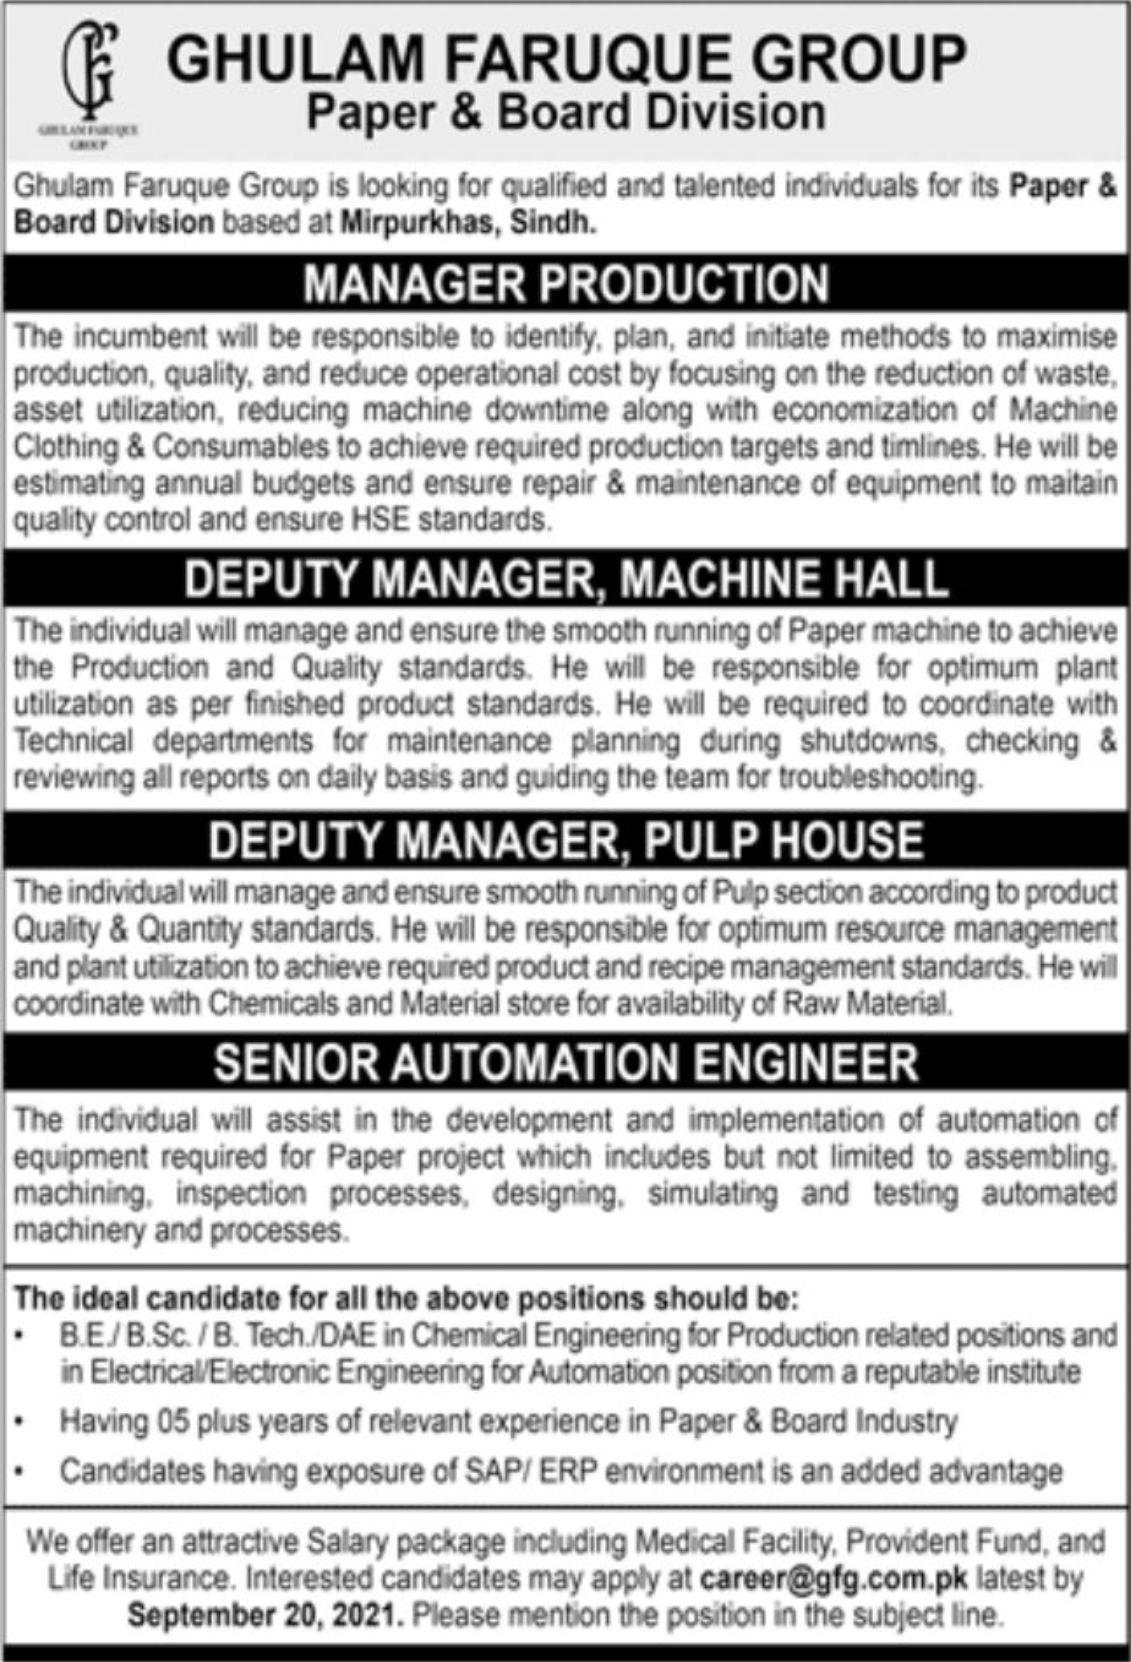 Ghulam Faruque Group Vacancies 2021 3